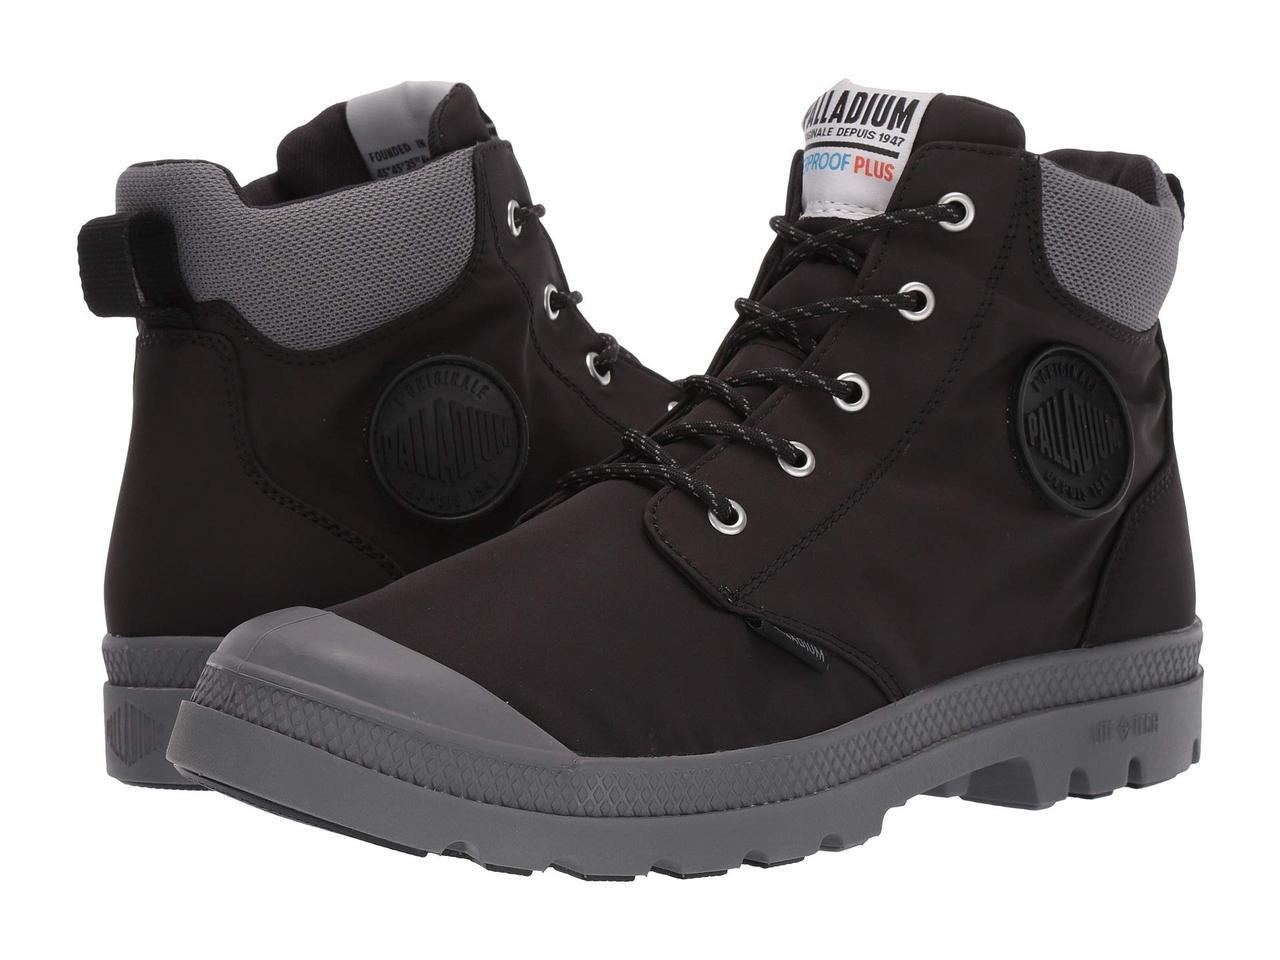 Ботинки Сапоги (Оригинал) Palladium Pampa Lite Cuff WP Black ... df40c679c0775